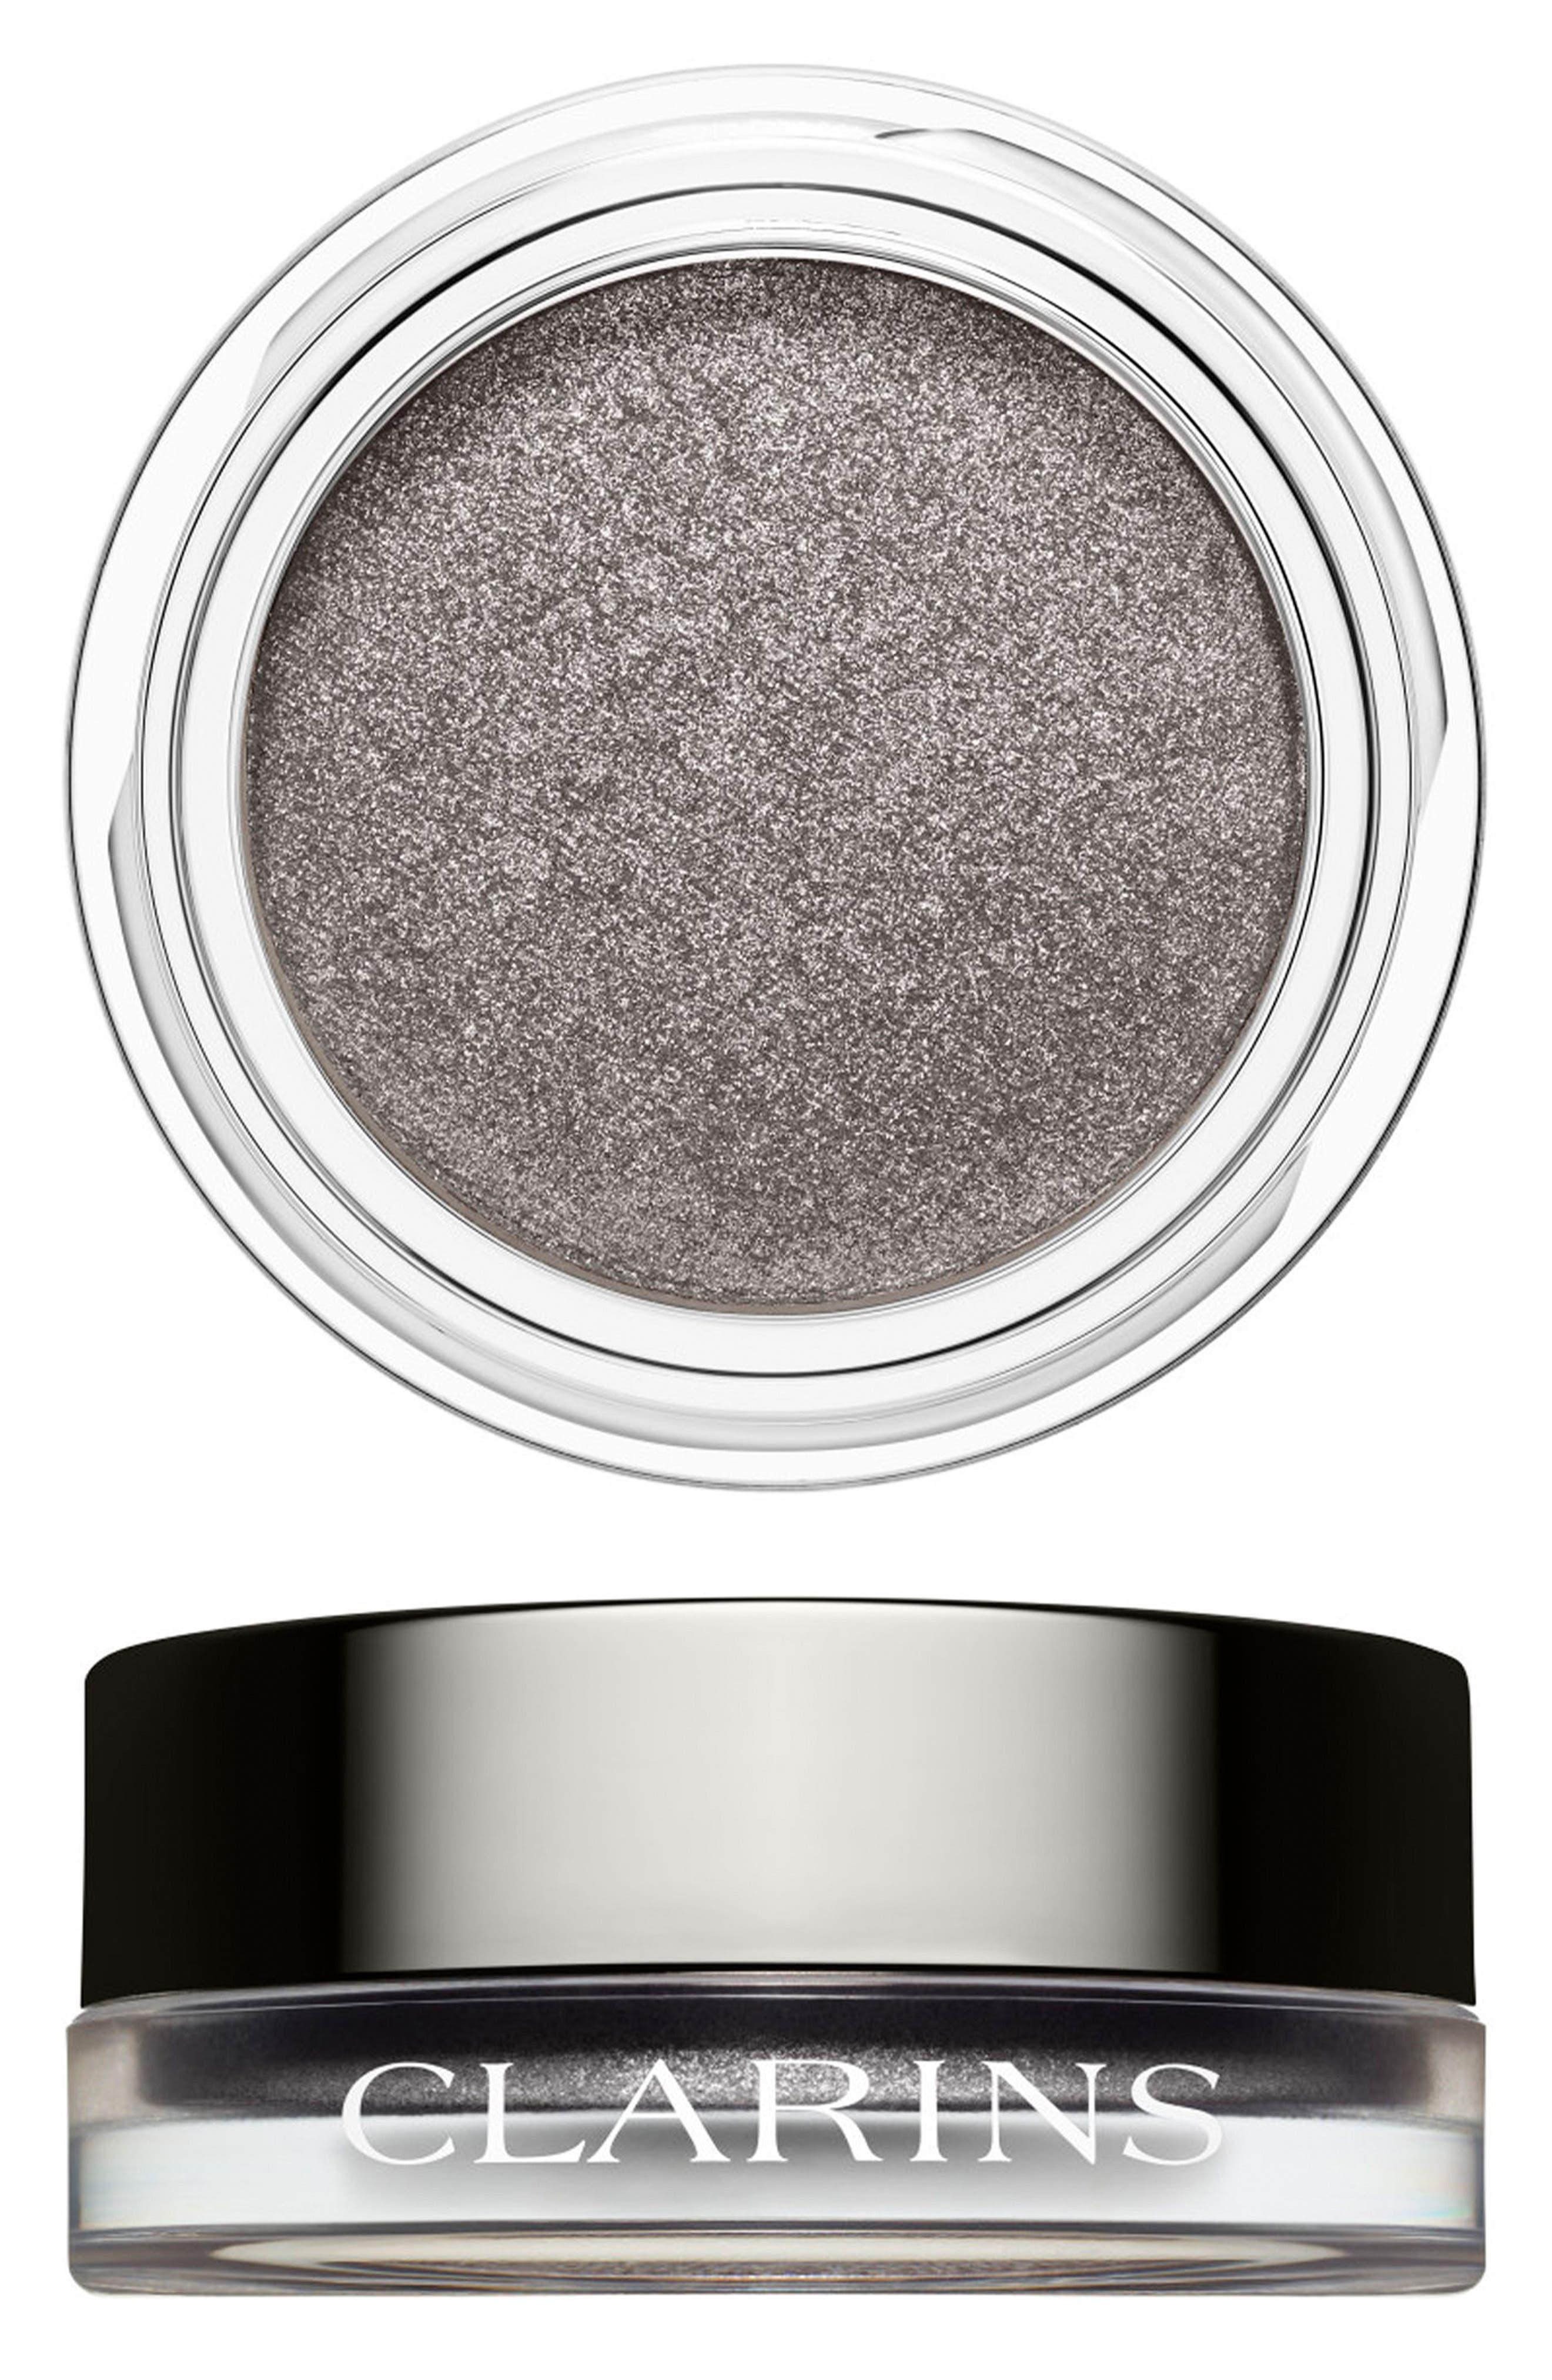 Ombré Iridescente Cream-to-Powder Iridescent Eyeshadow,                         Main,                         color, SILVER GREY 10